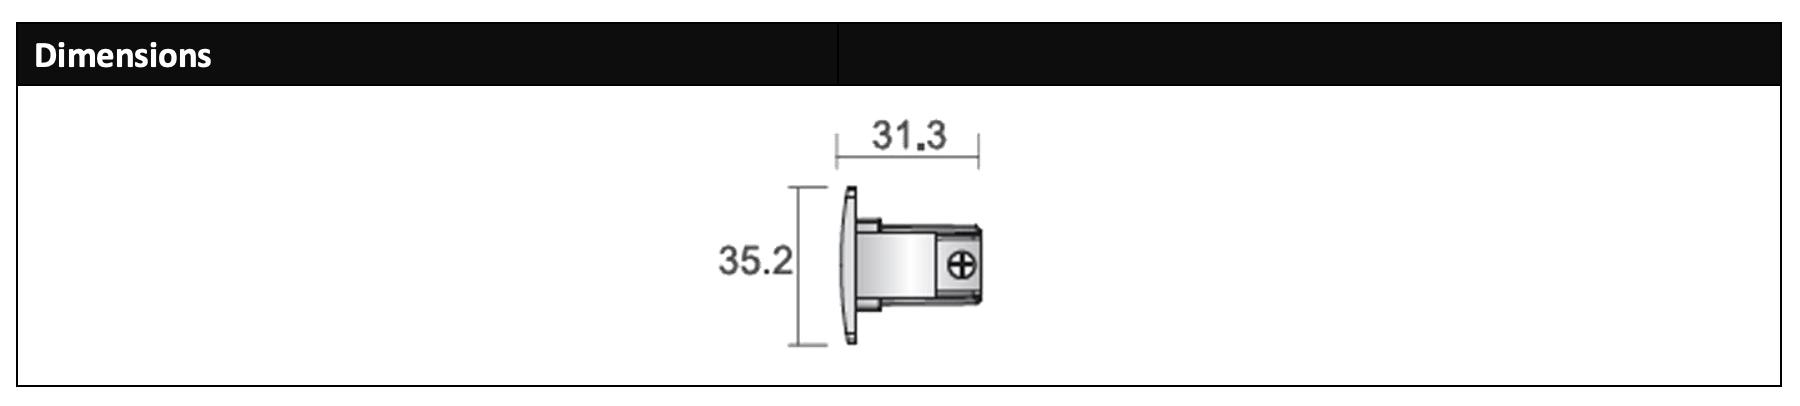 Powergear Pro- 0432 LED-sporhætte dimensioner